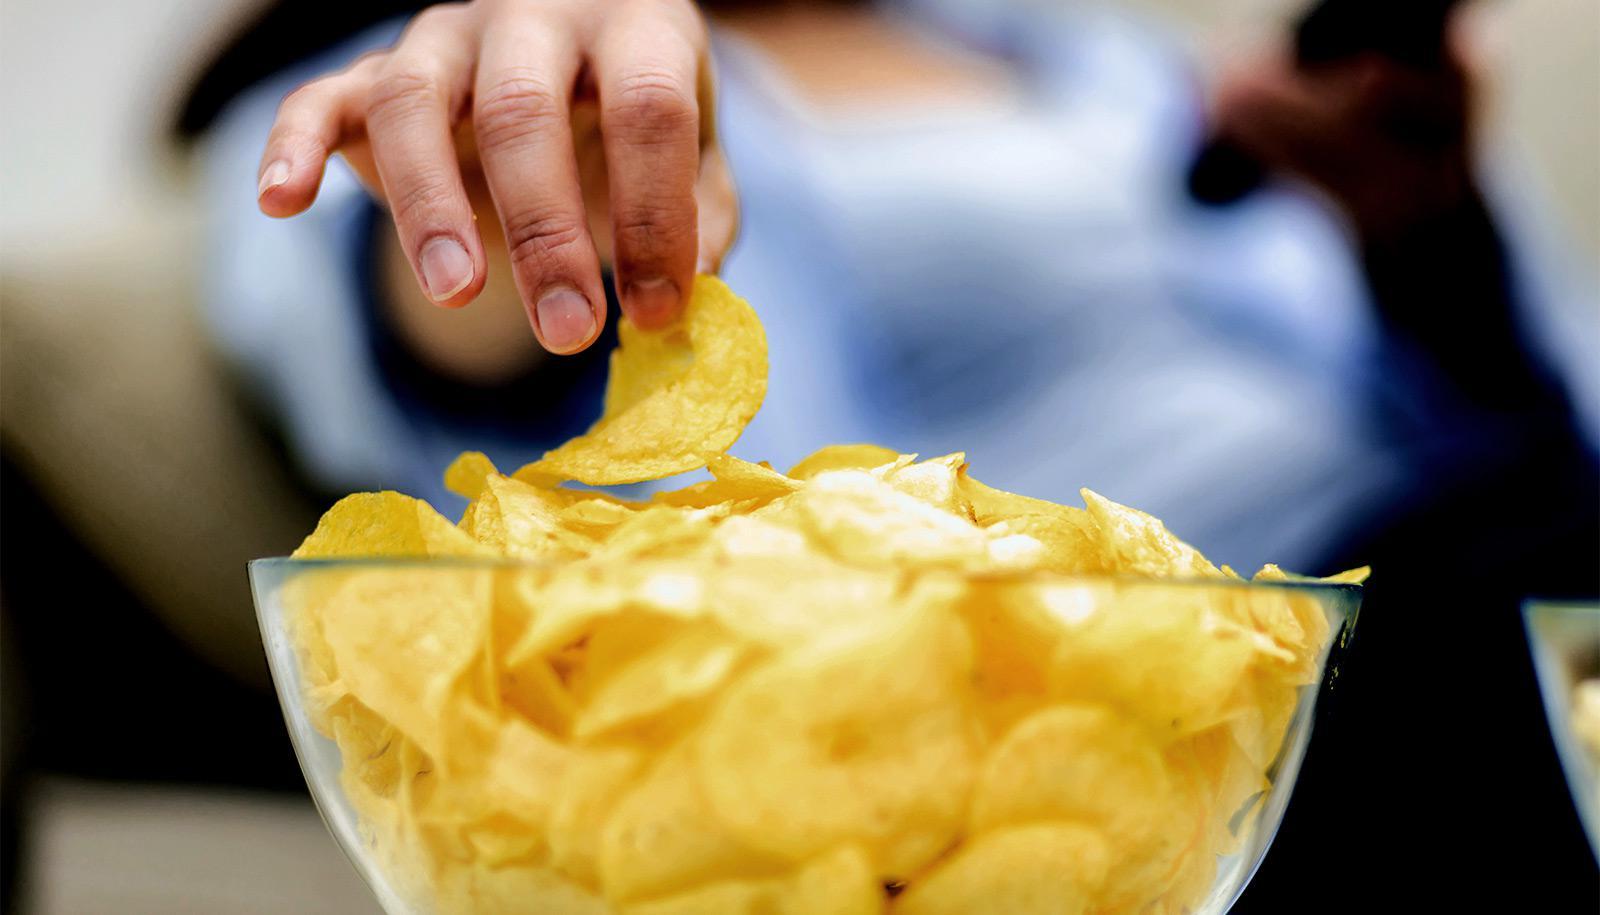 A woman grabs a potato chip from a bowl